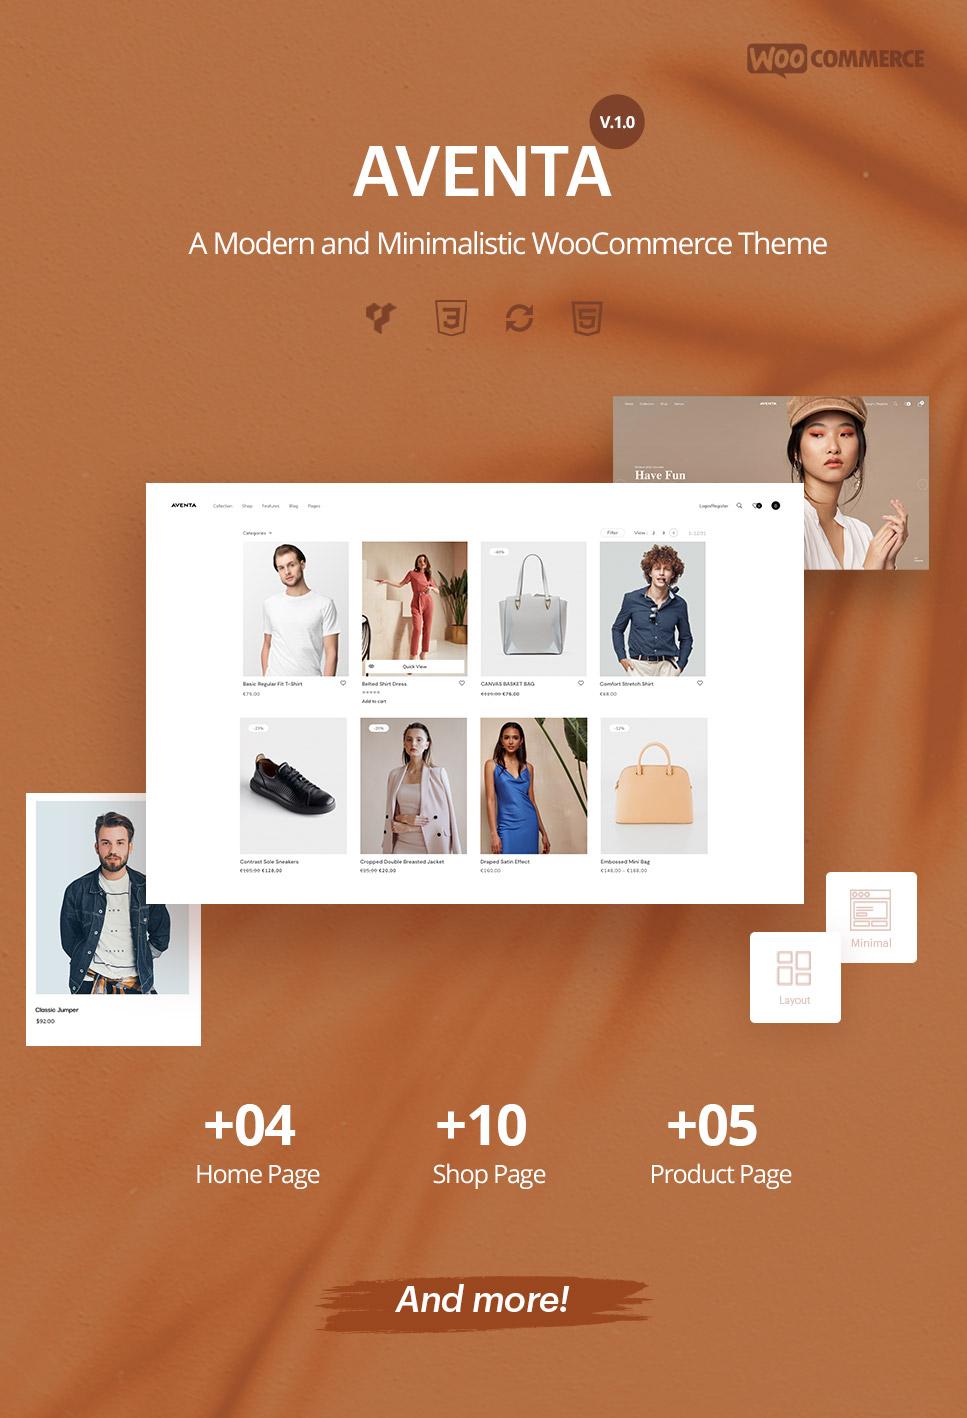 Aventa - Minimal & modern woocommerce theme